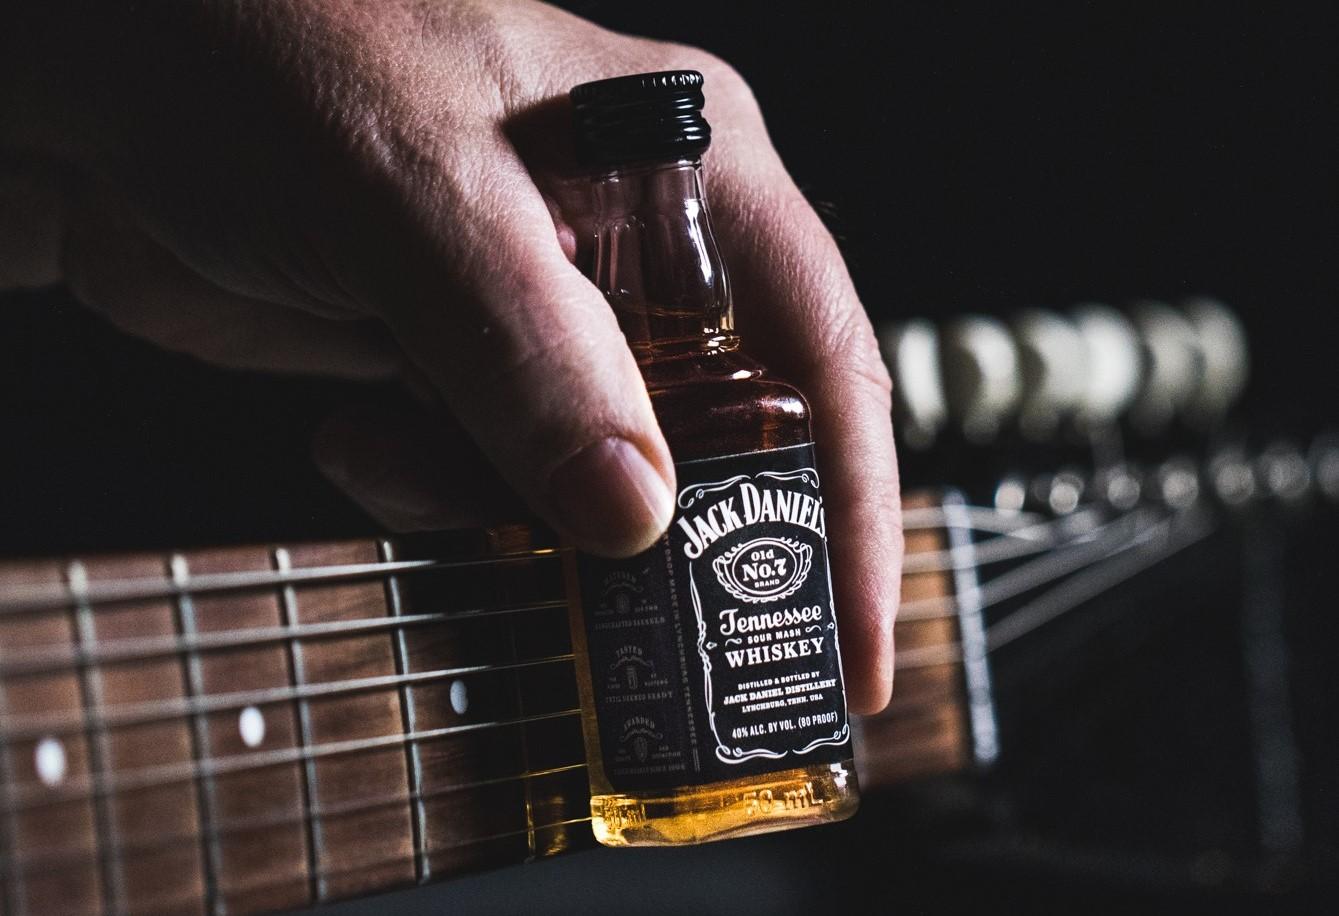 Jack Daniel's #insiemeperlamusica